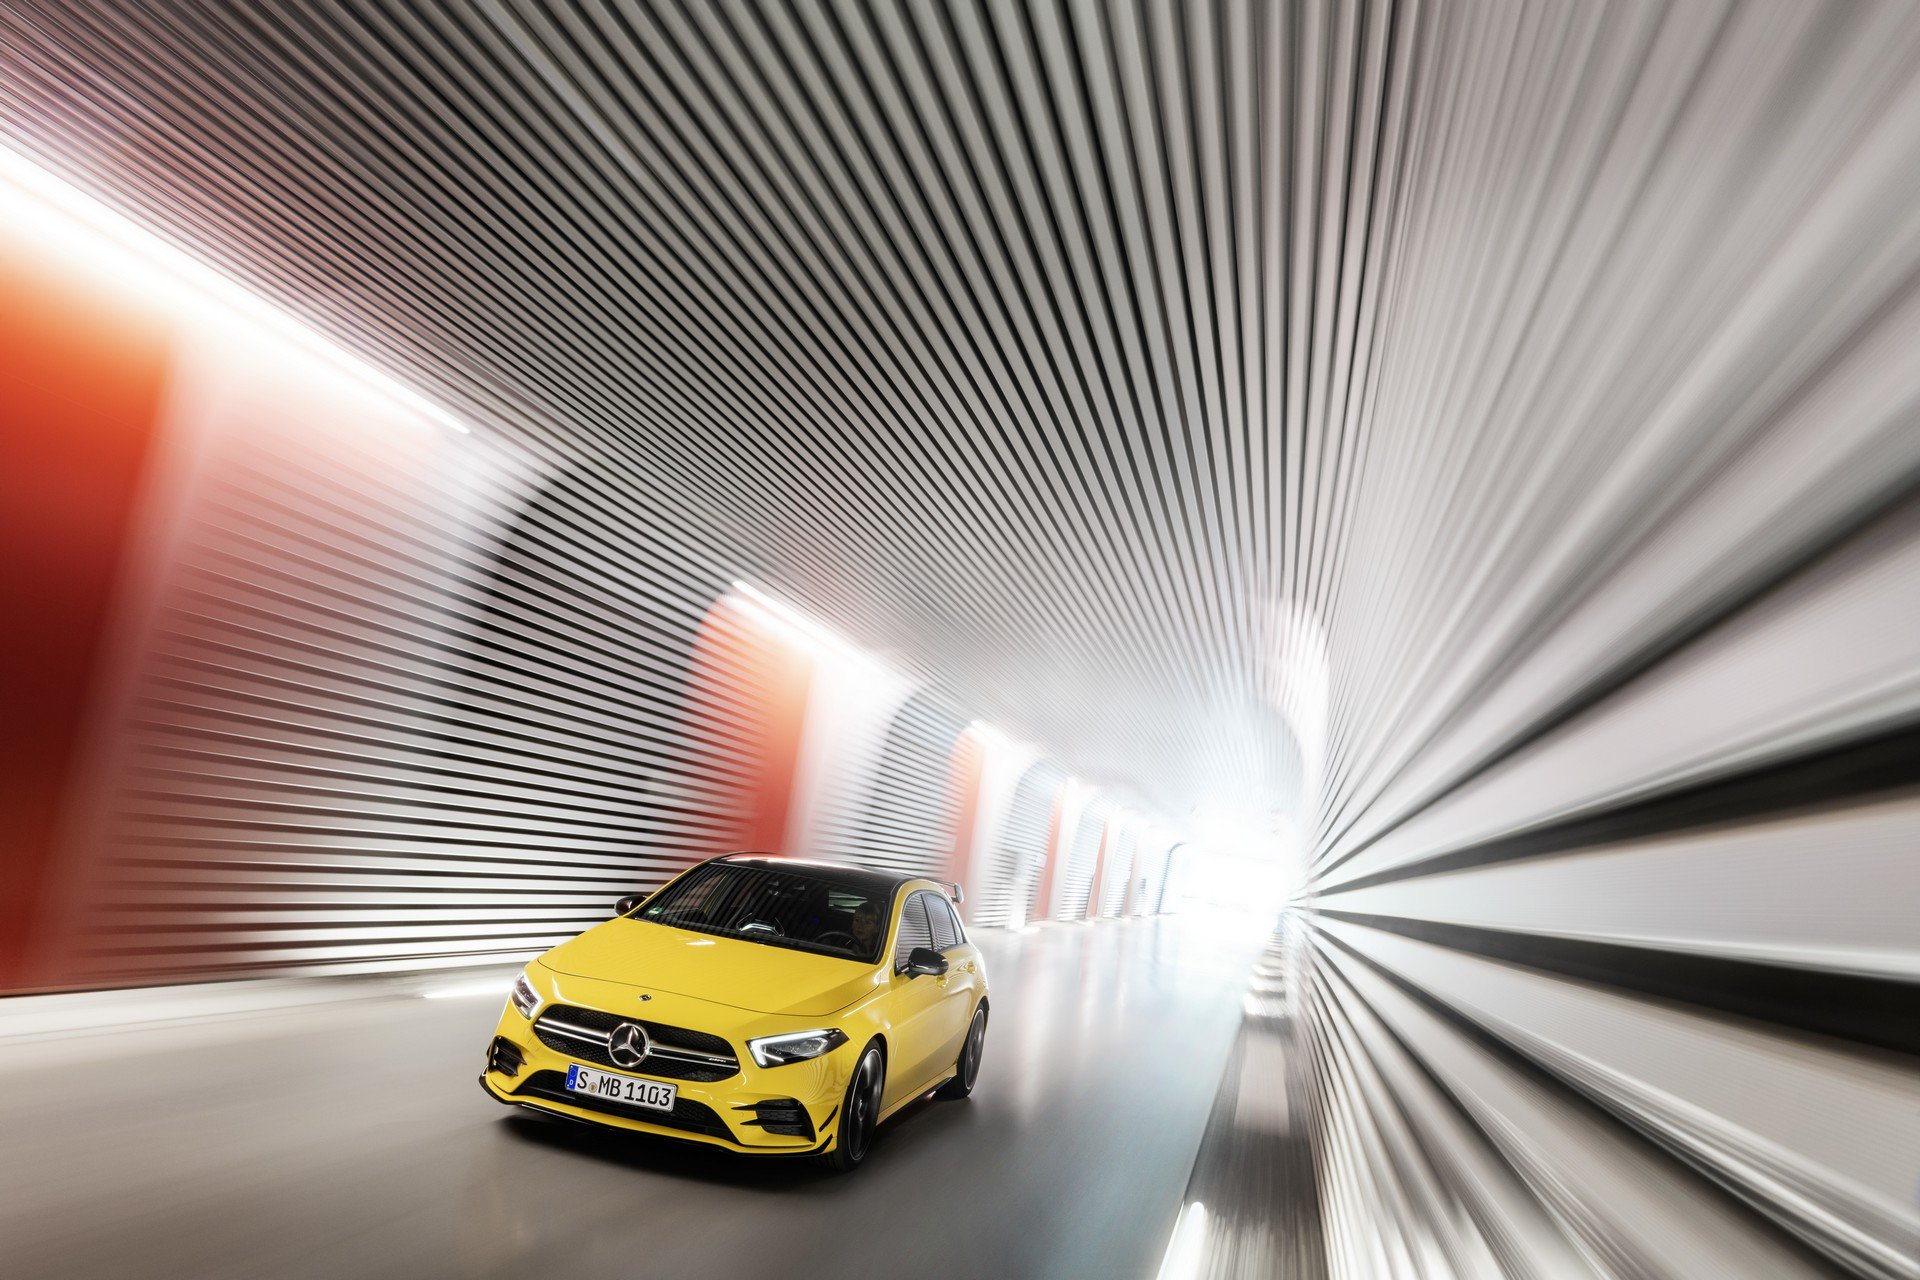 Noul Mercedes-AMG A 35 4MATIC – Imagini și informații oficiale